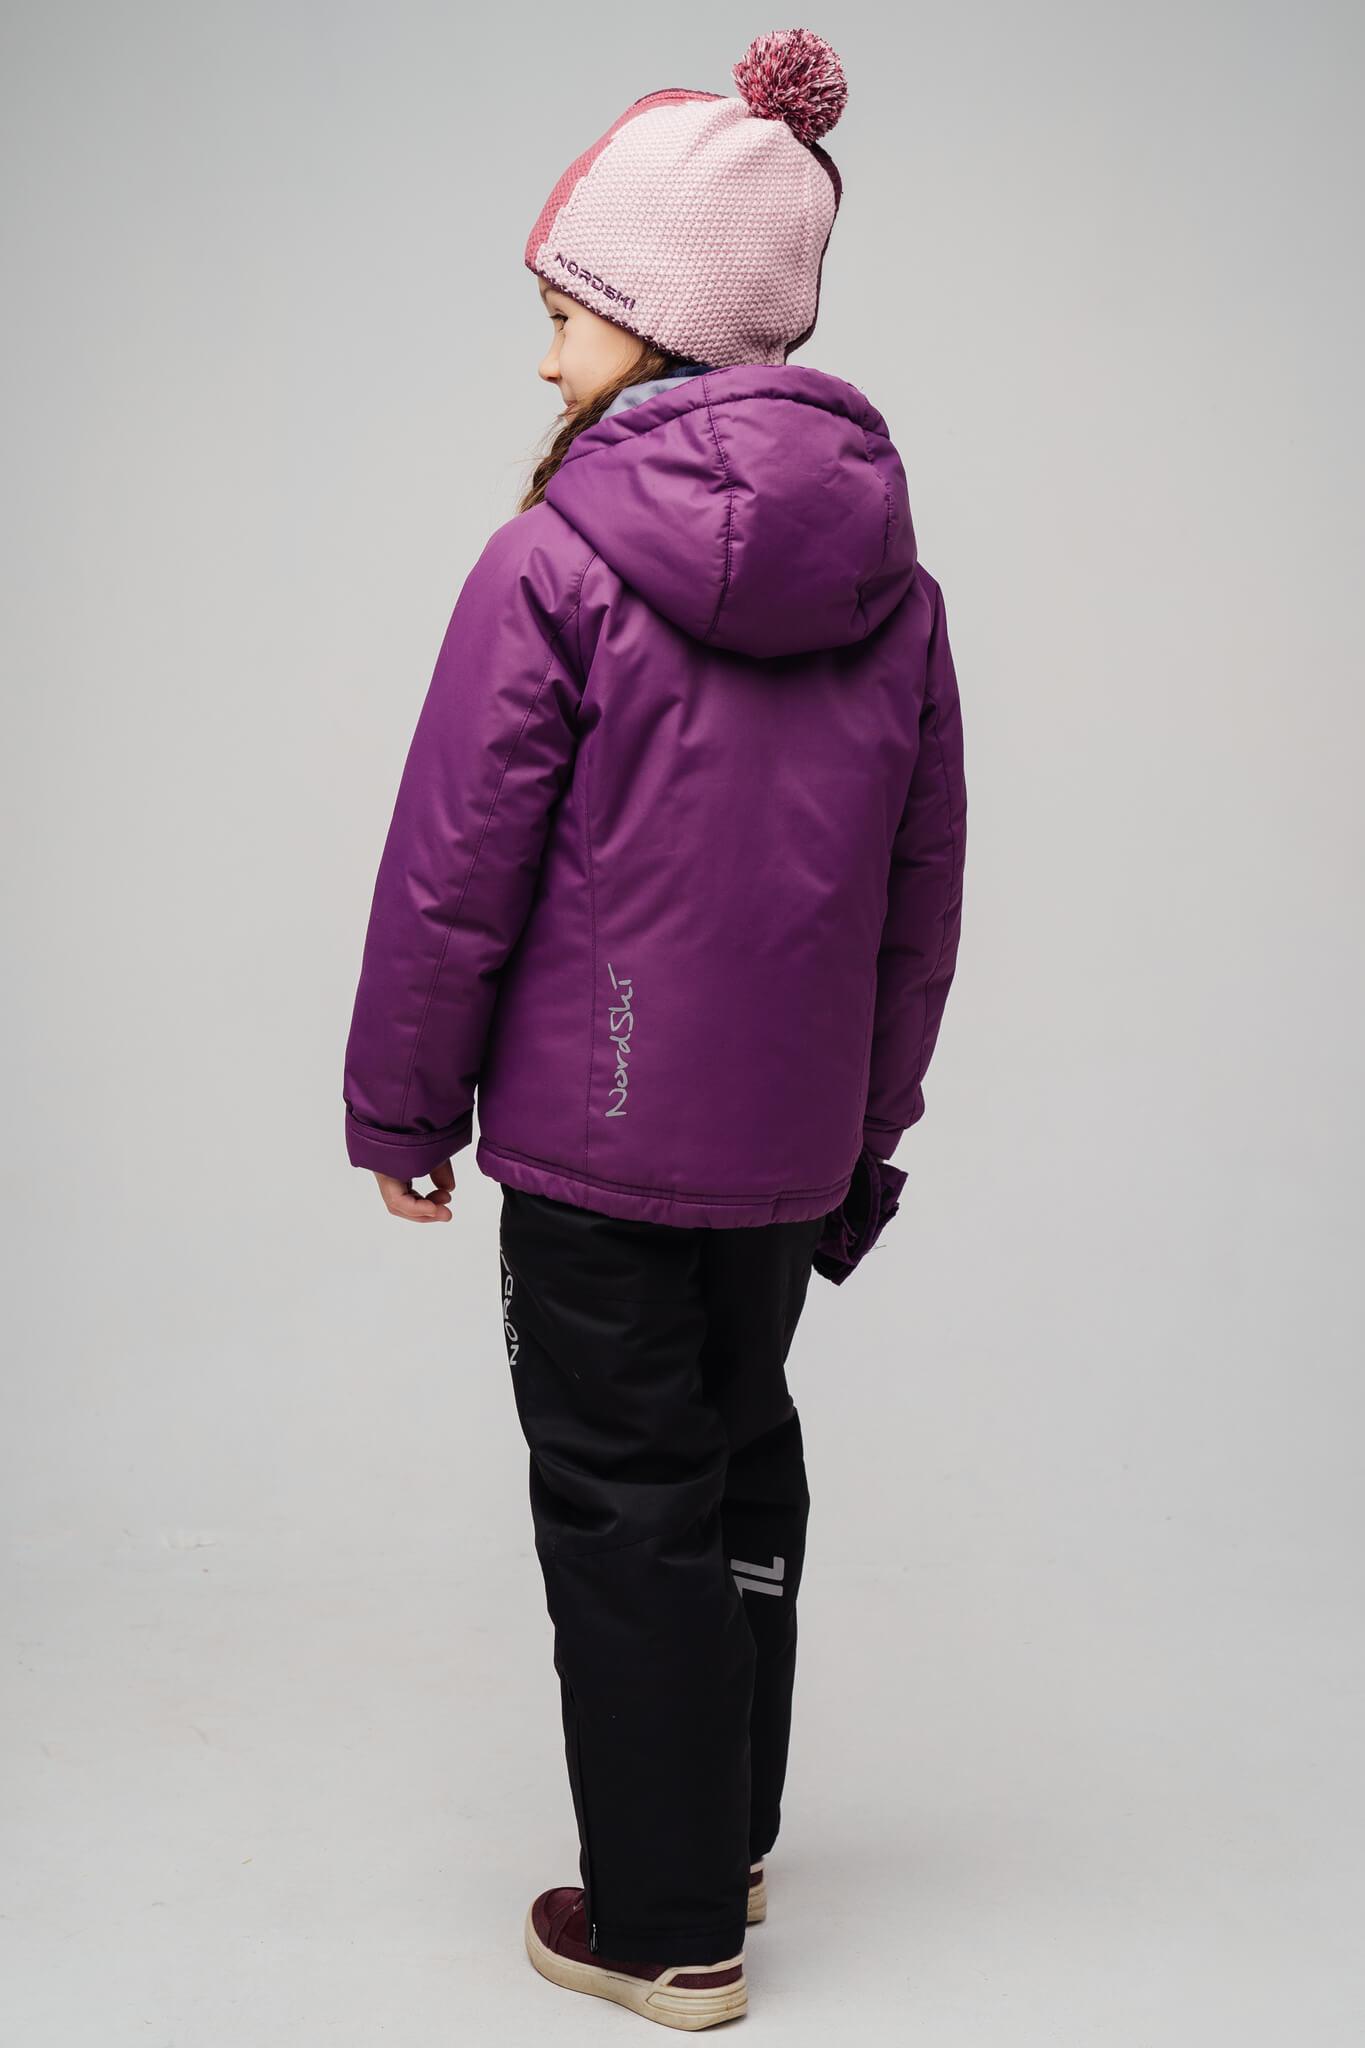 Nordski Kids Motion прогулочная лыжная куртка детская purple - 2